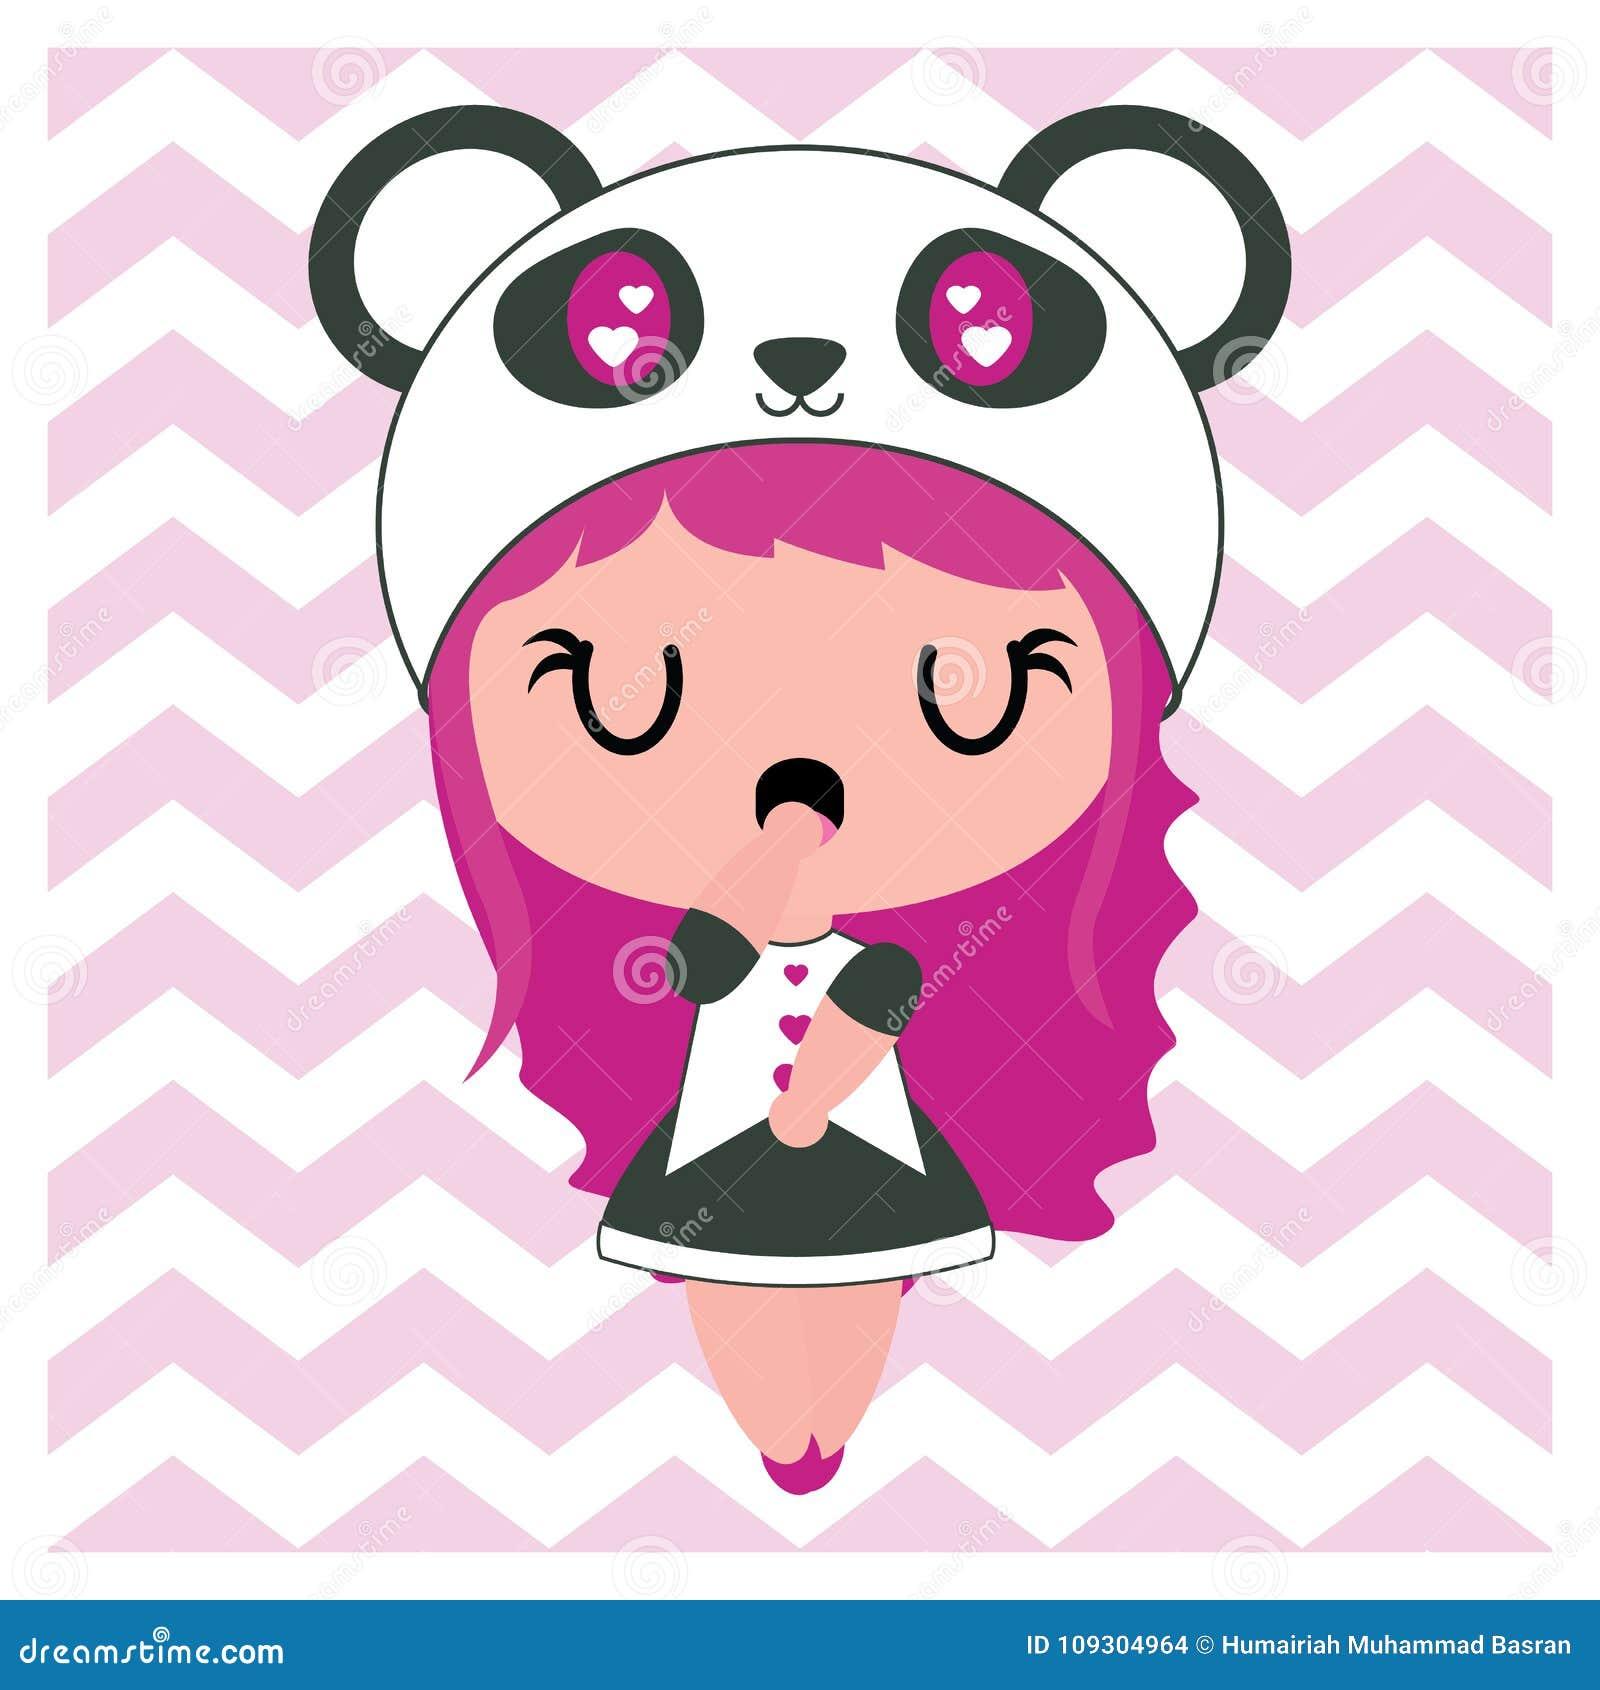 Cute Panda Girl On Chevron Background Cartoon Illustration For Baby Nursery Wall Stock Illustration Illustration Of Character Custom 109304964